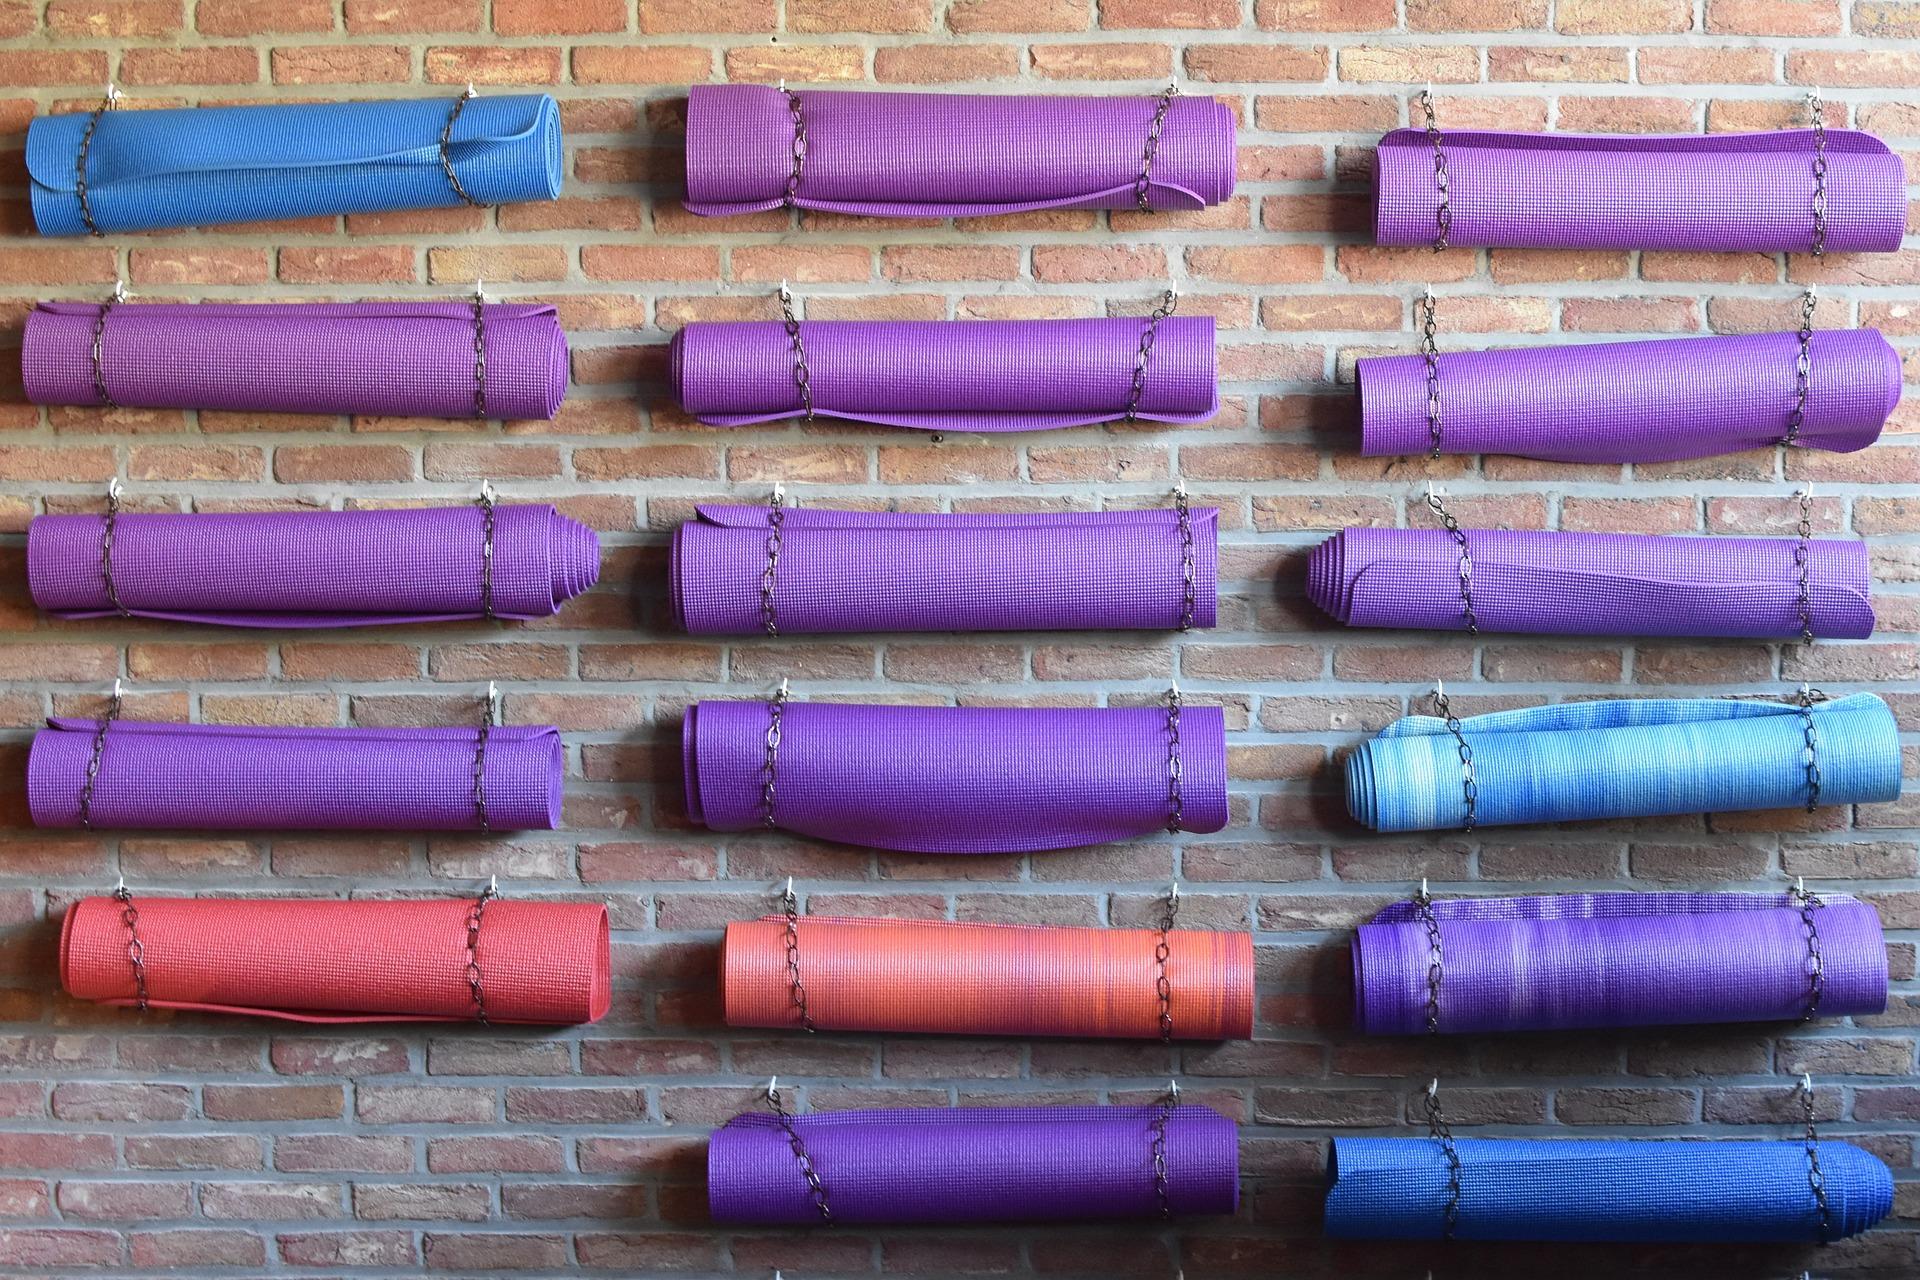 a brick wall with hanging yoga mats.